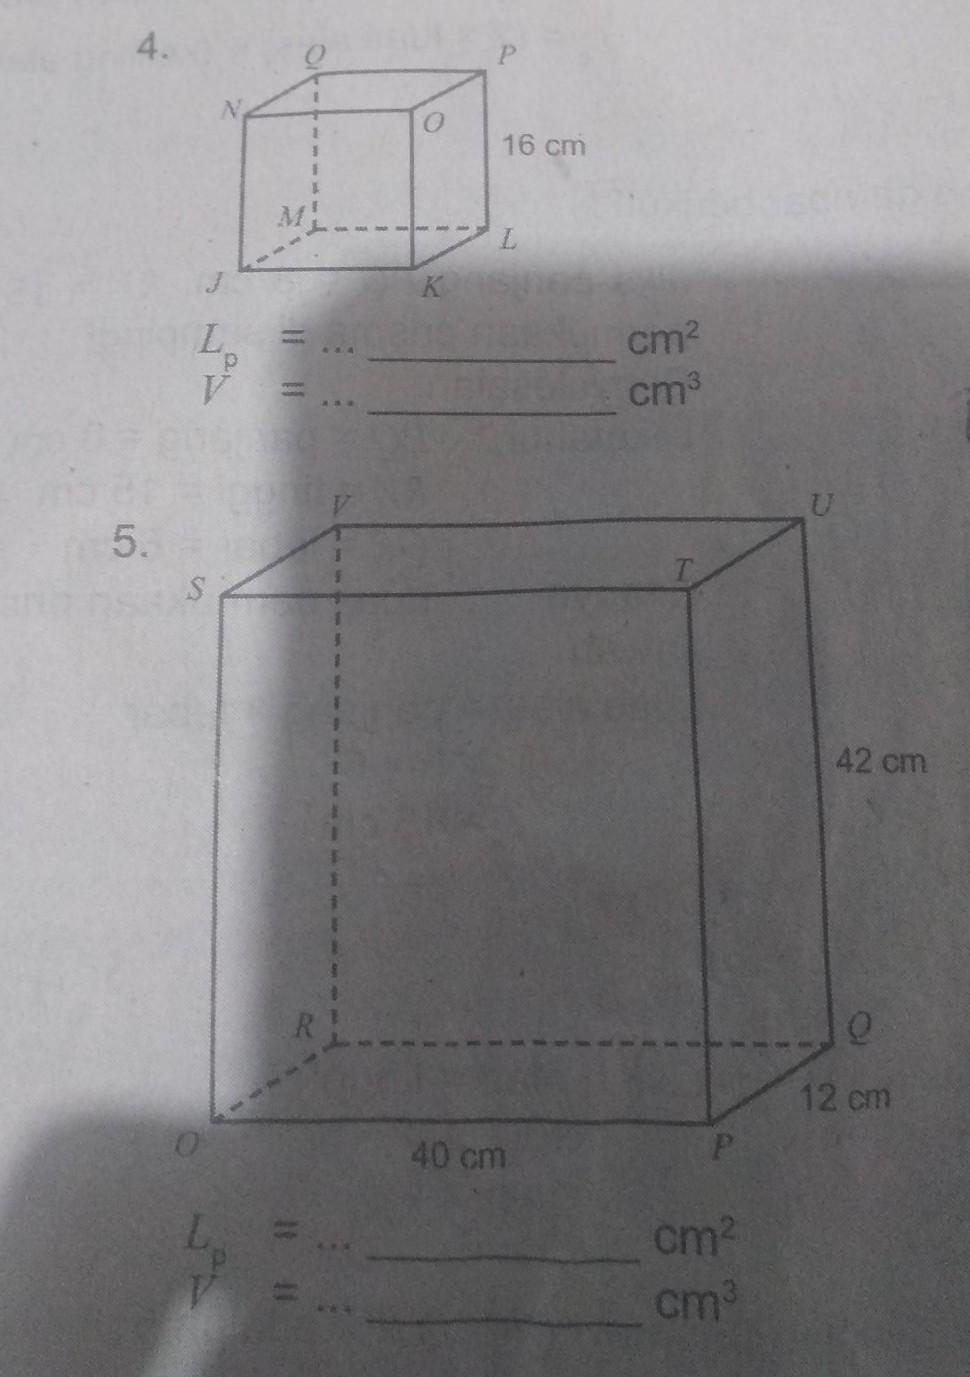 Luas Prisma Segi Empat : prisma, empat, Tentukan, Permukaan, Volume, Prisma, Empat, Bawah, Tolong, Ya..., Brainly.co.id